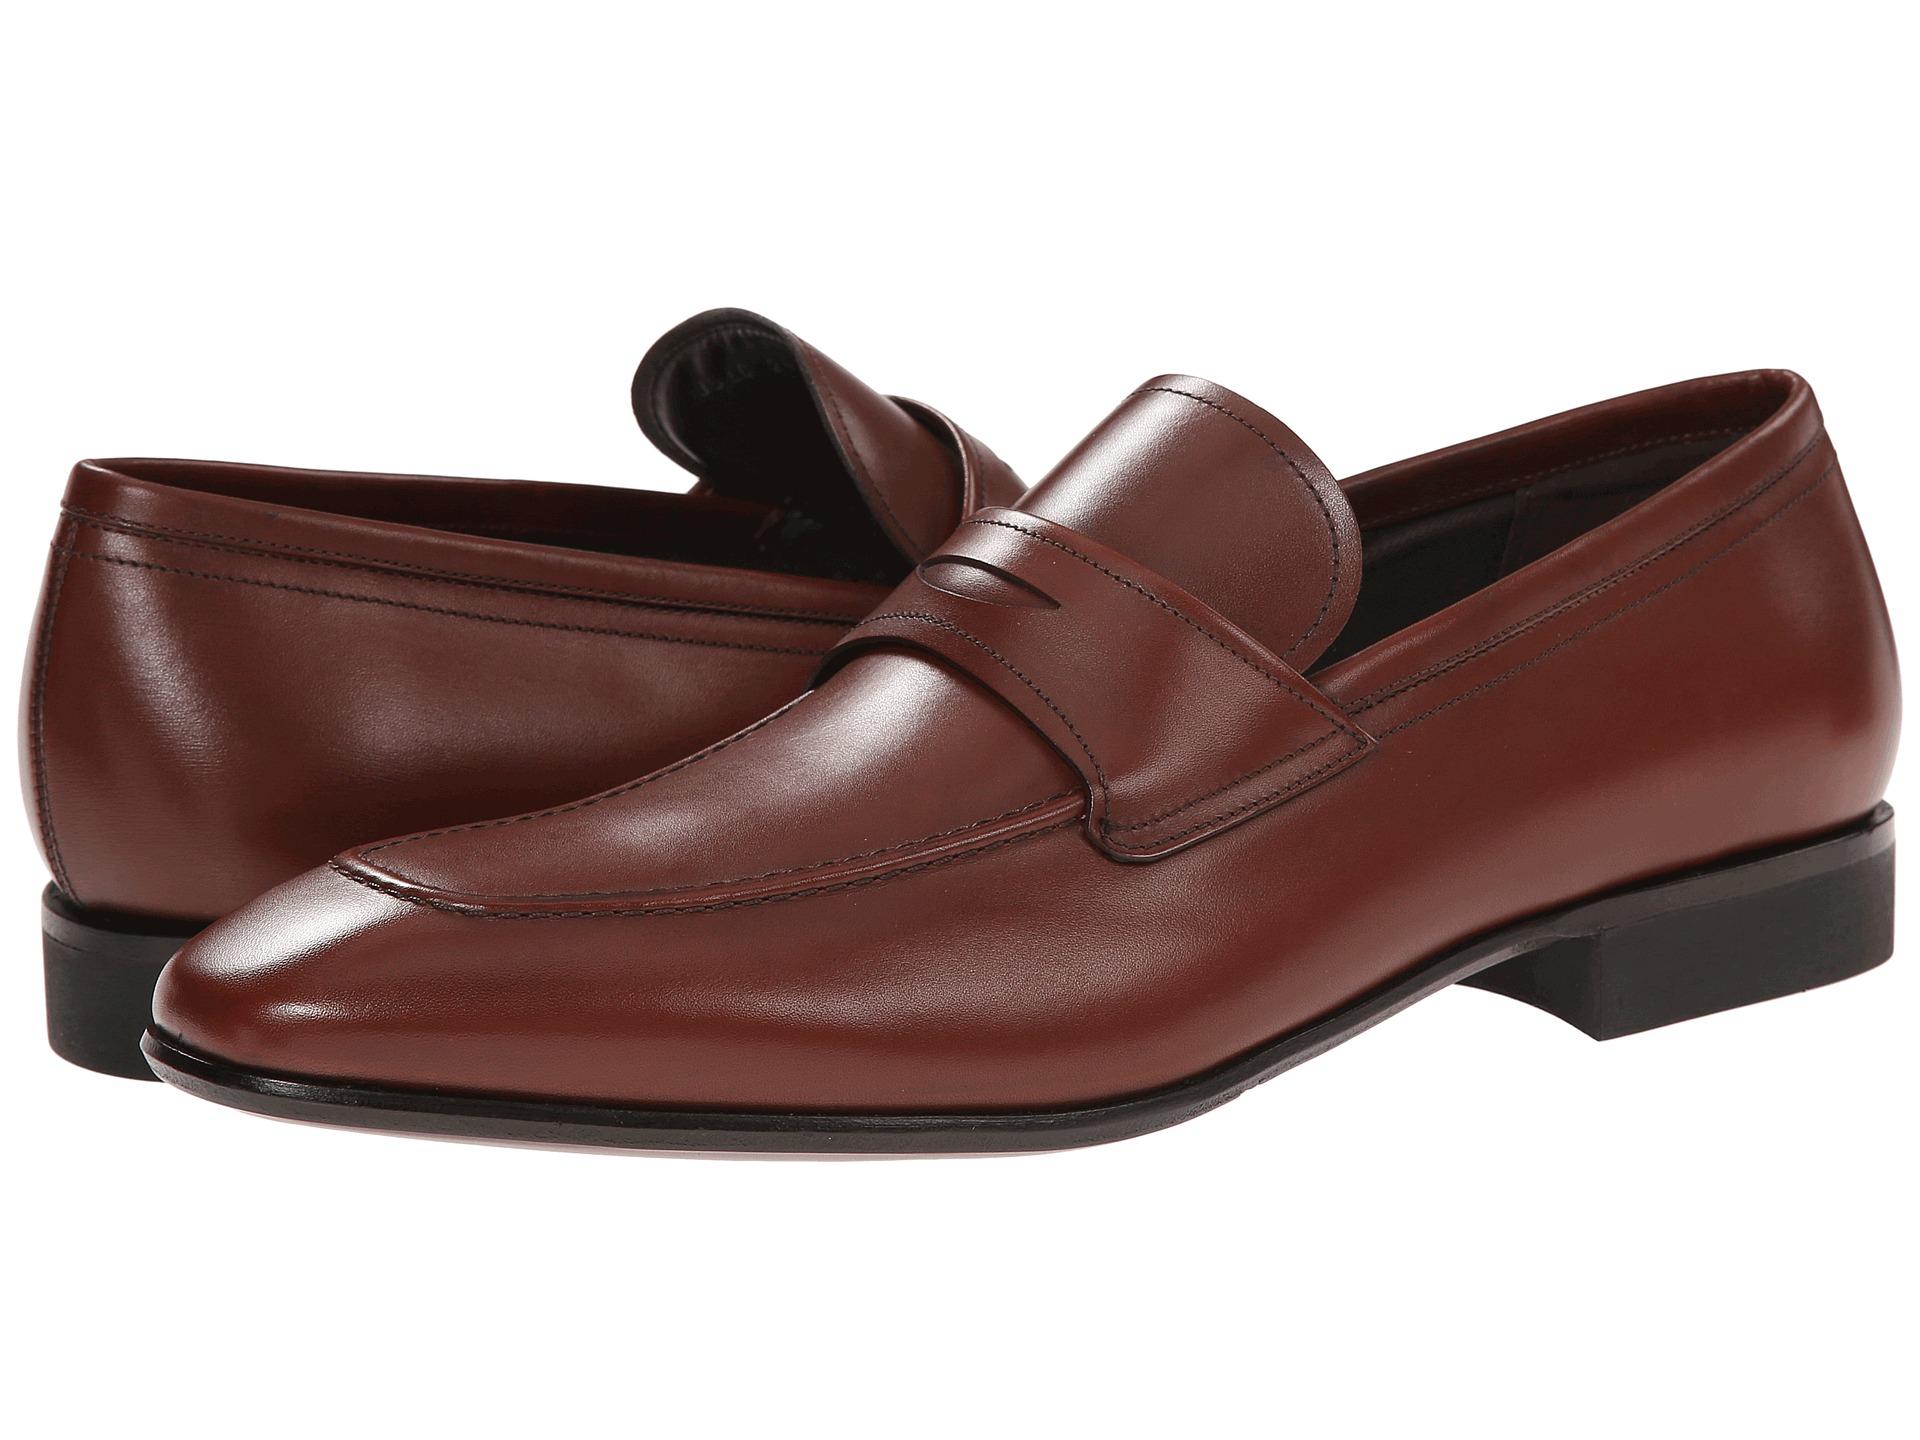 Ferragamo Metro Loafer In Brown For Men | Lyst